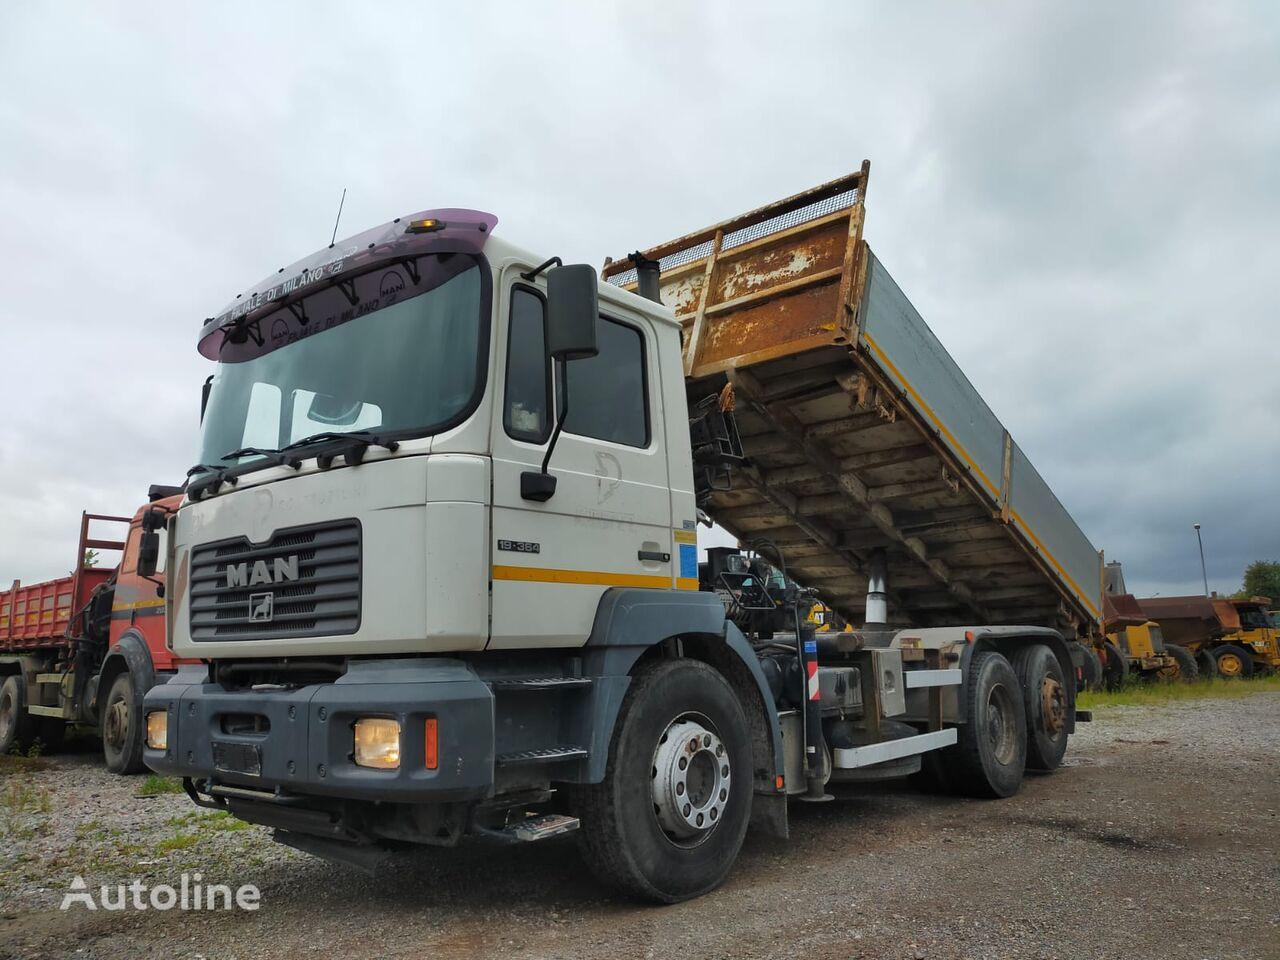 camion-benne MAN 19.364 - 6x2 ///ALL STEEL///